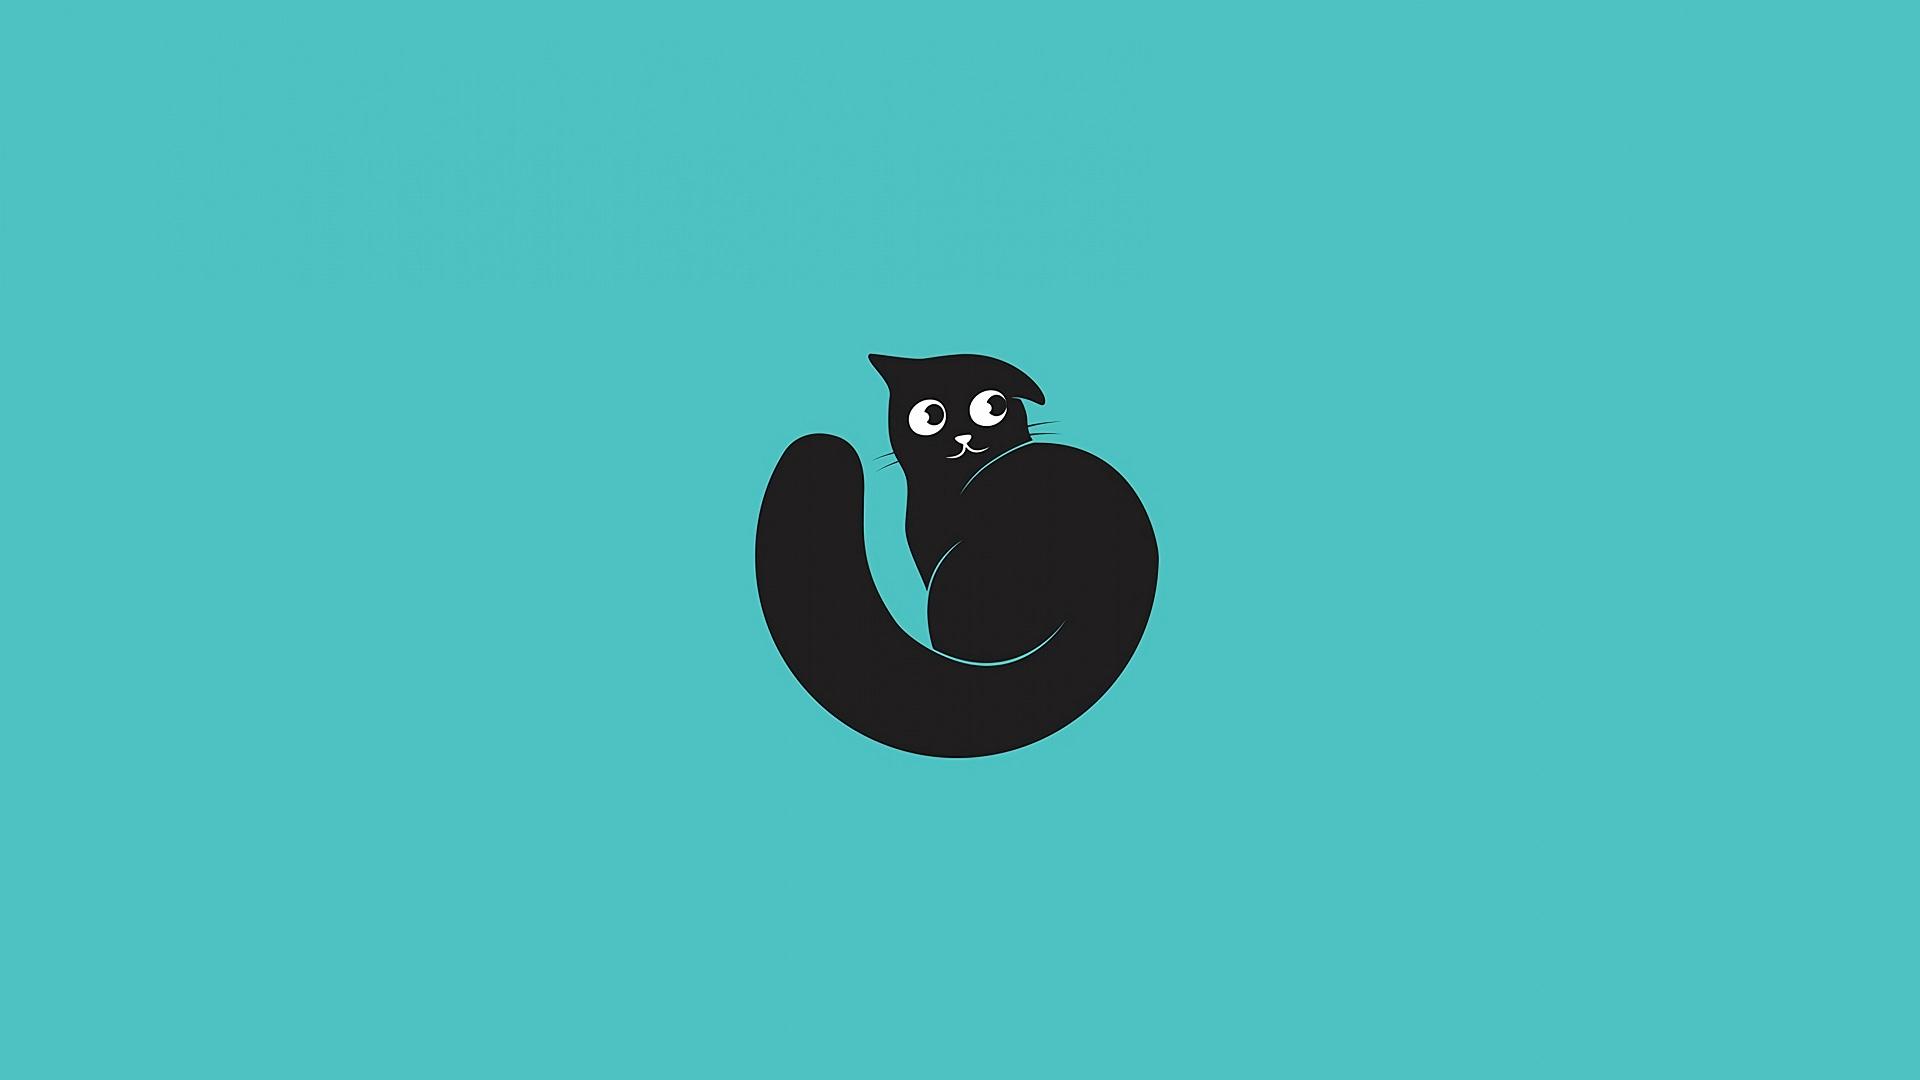 General 1920x1080 cats animals minimalism Black Cat black cats cyan cyan background